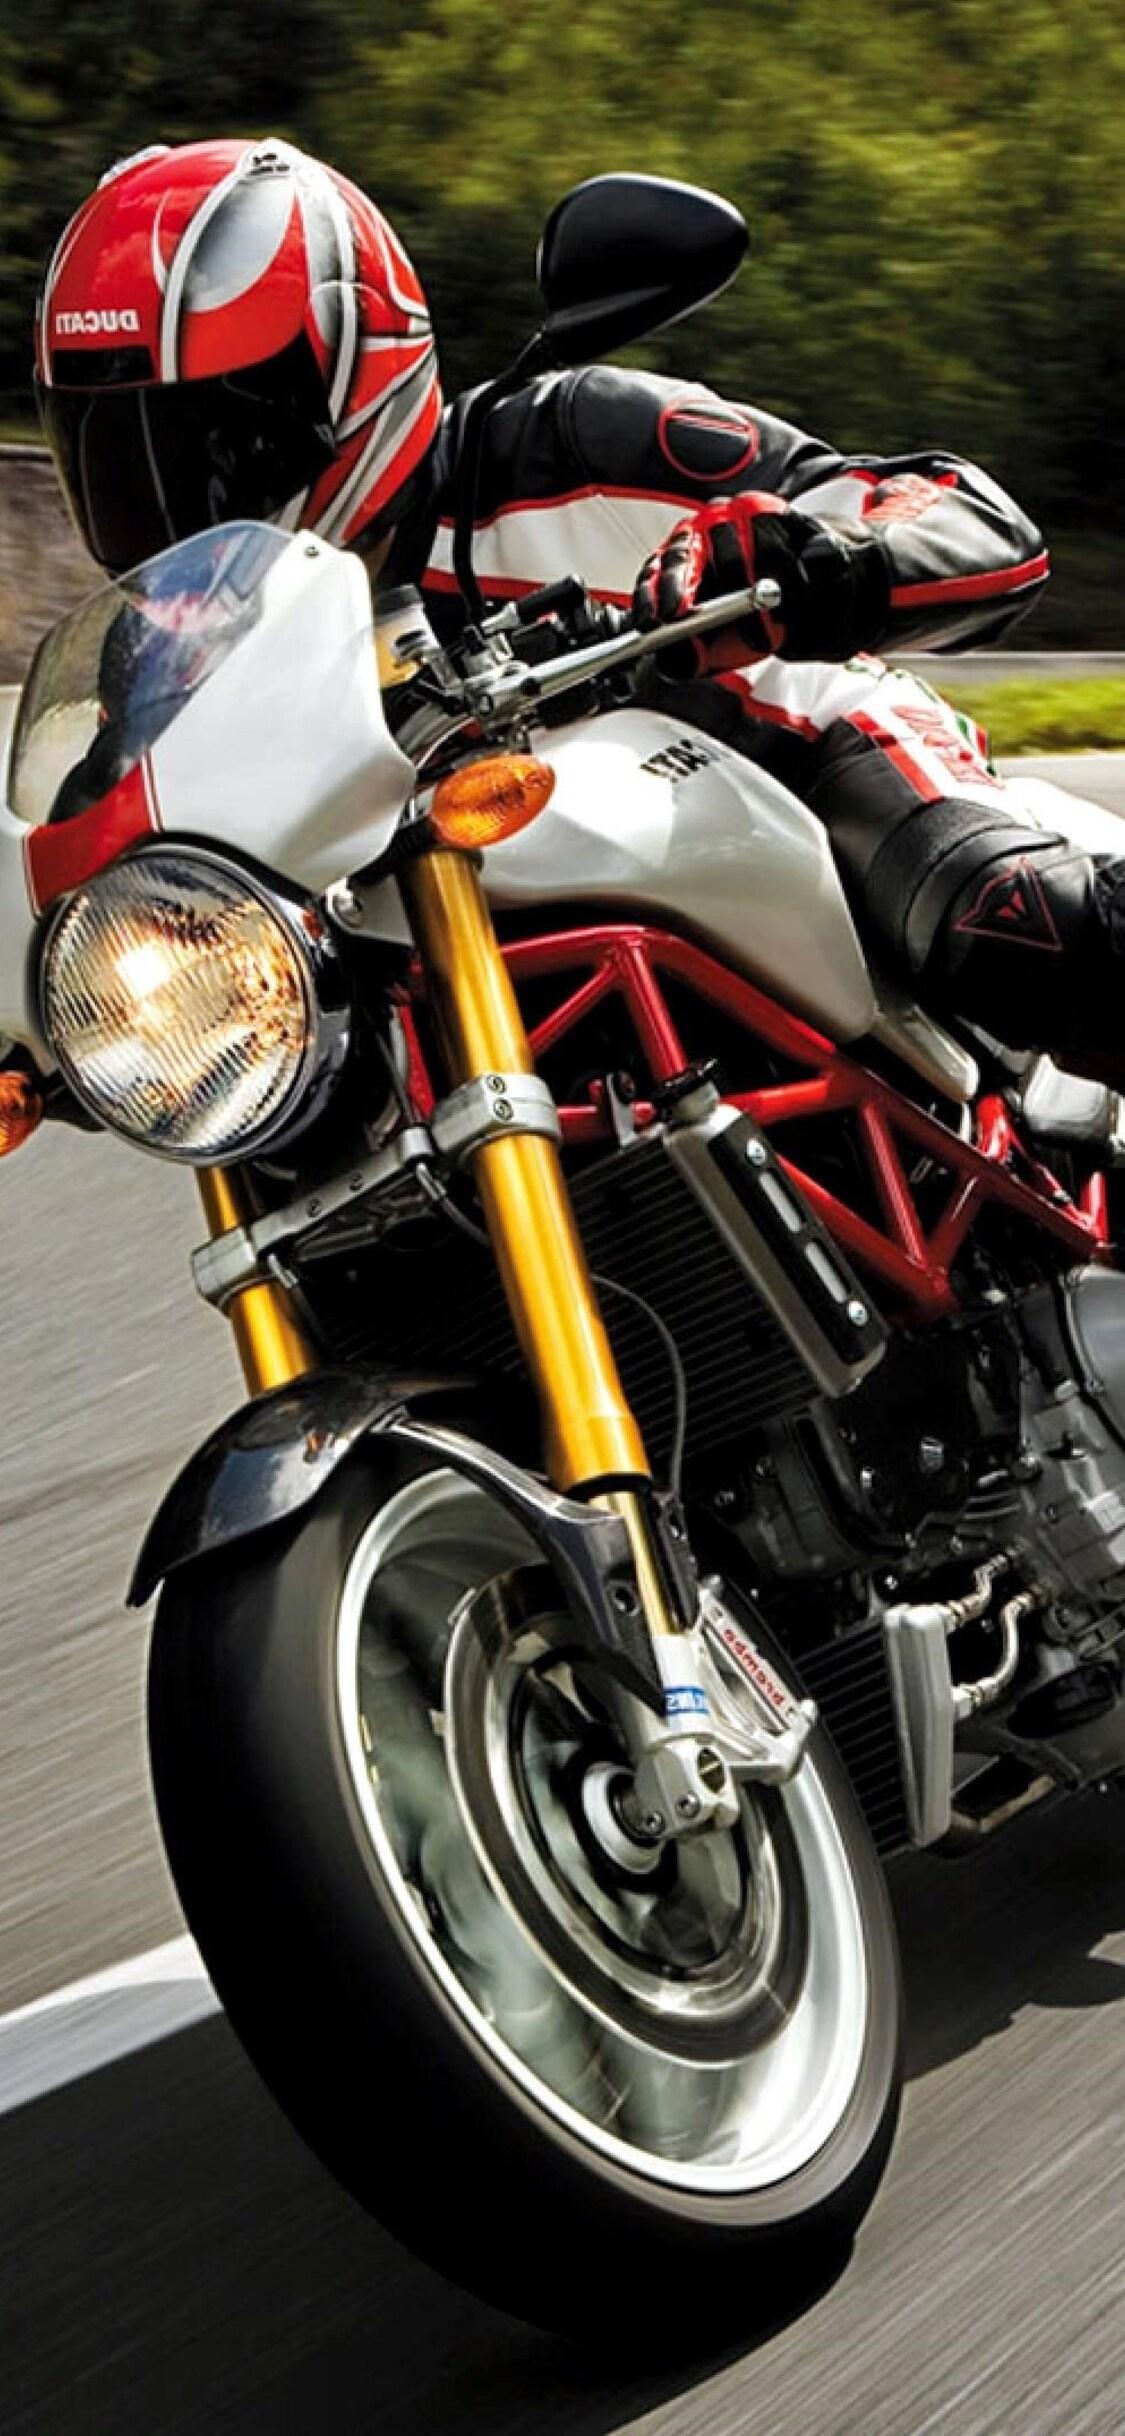 1125x2436 Ducati Monster S4r Iphone Xs Iphone 10 Iphone X Hd 4k